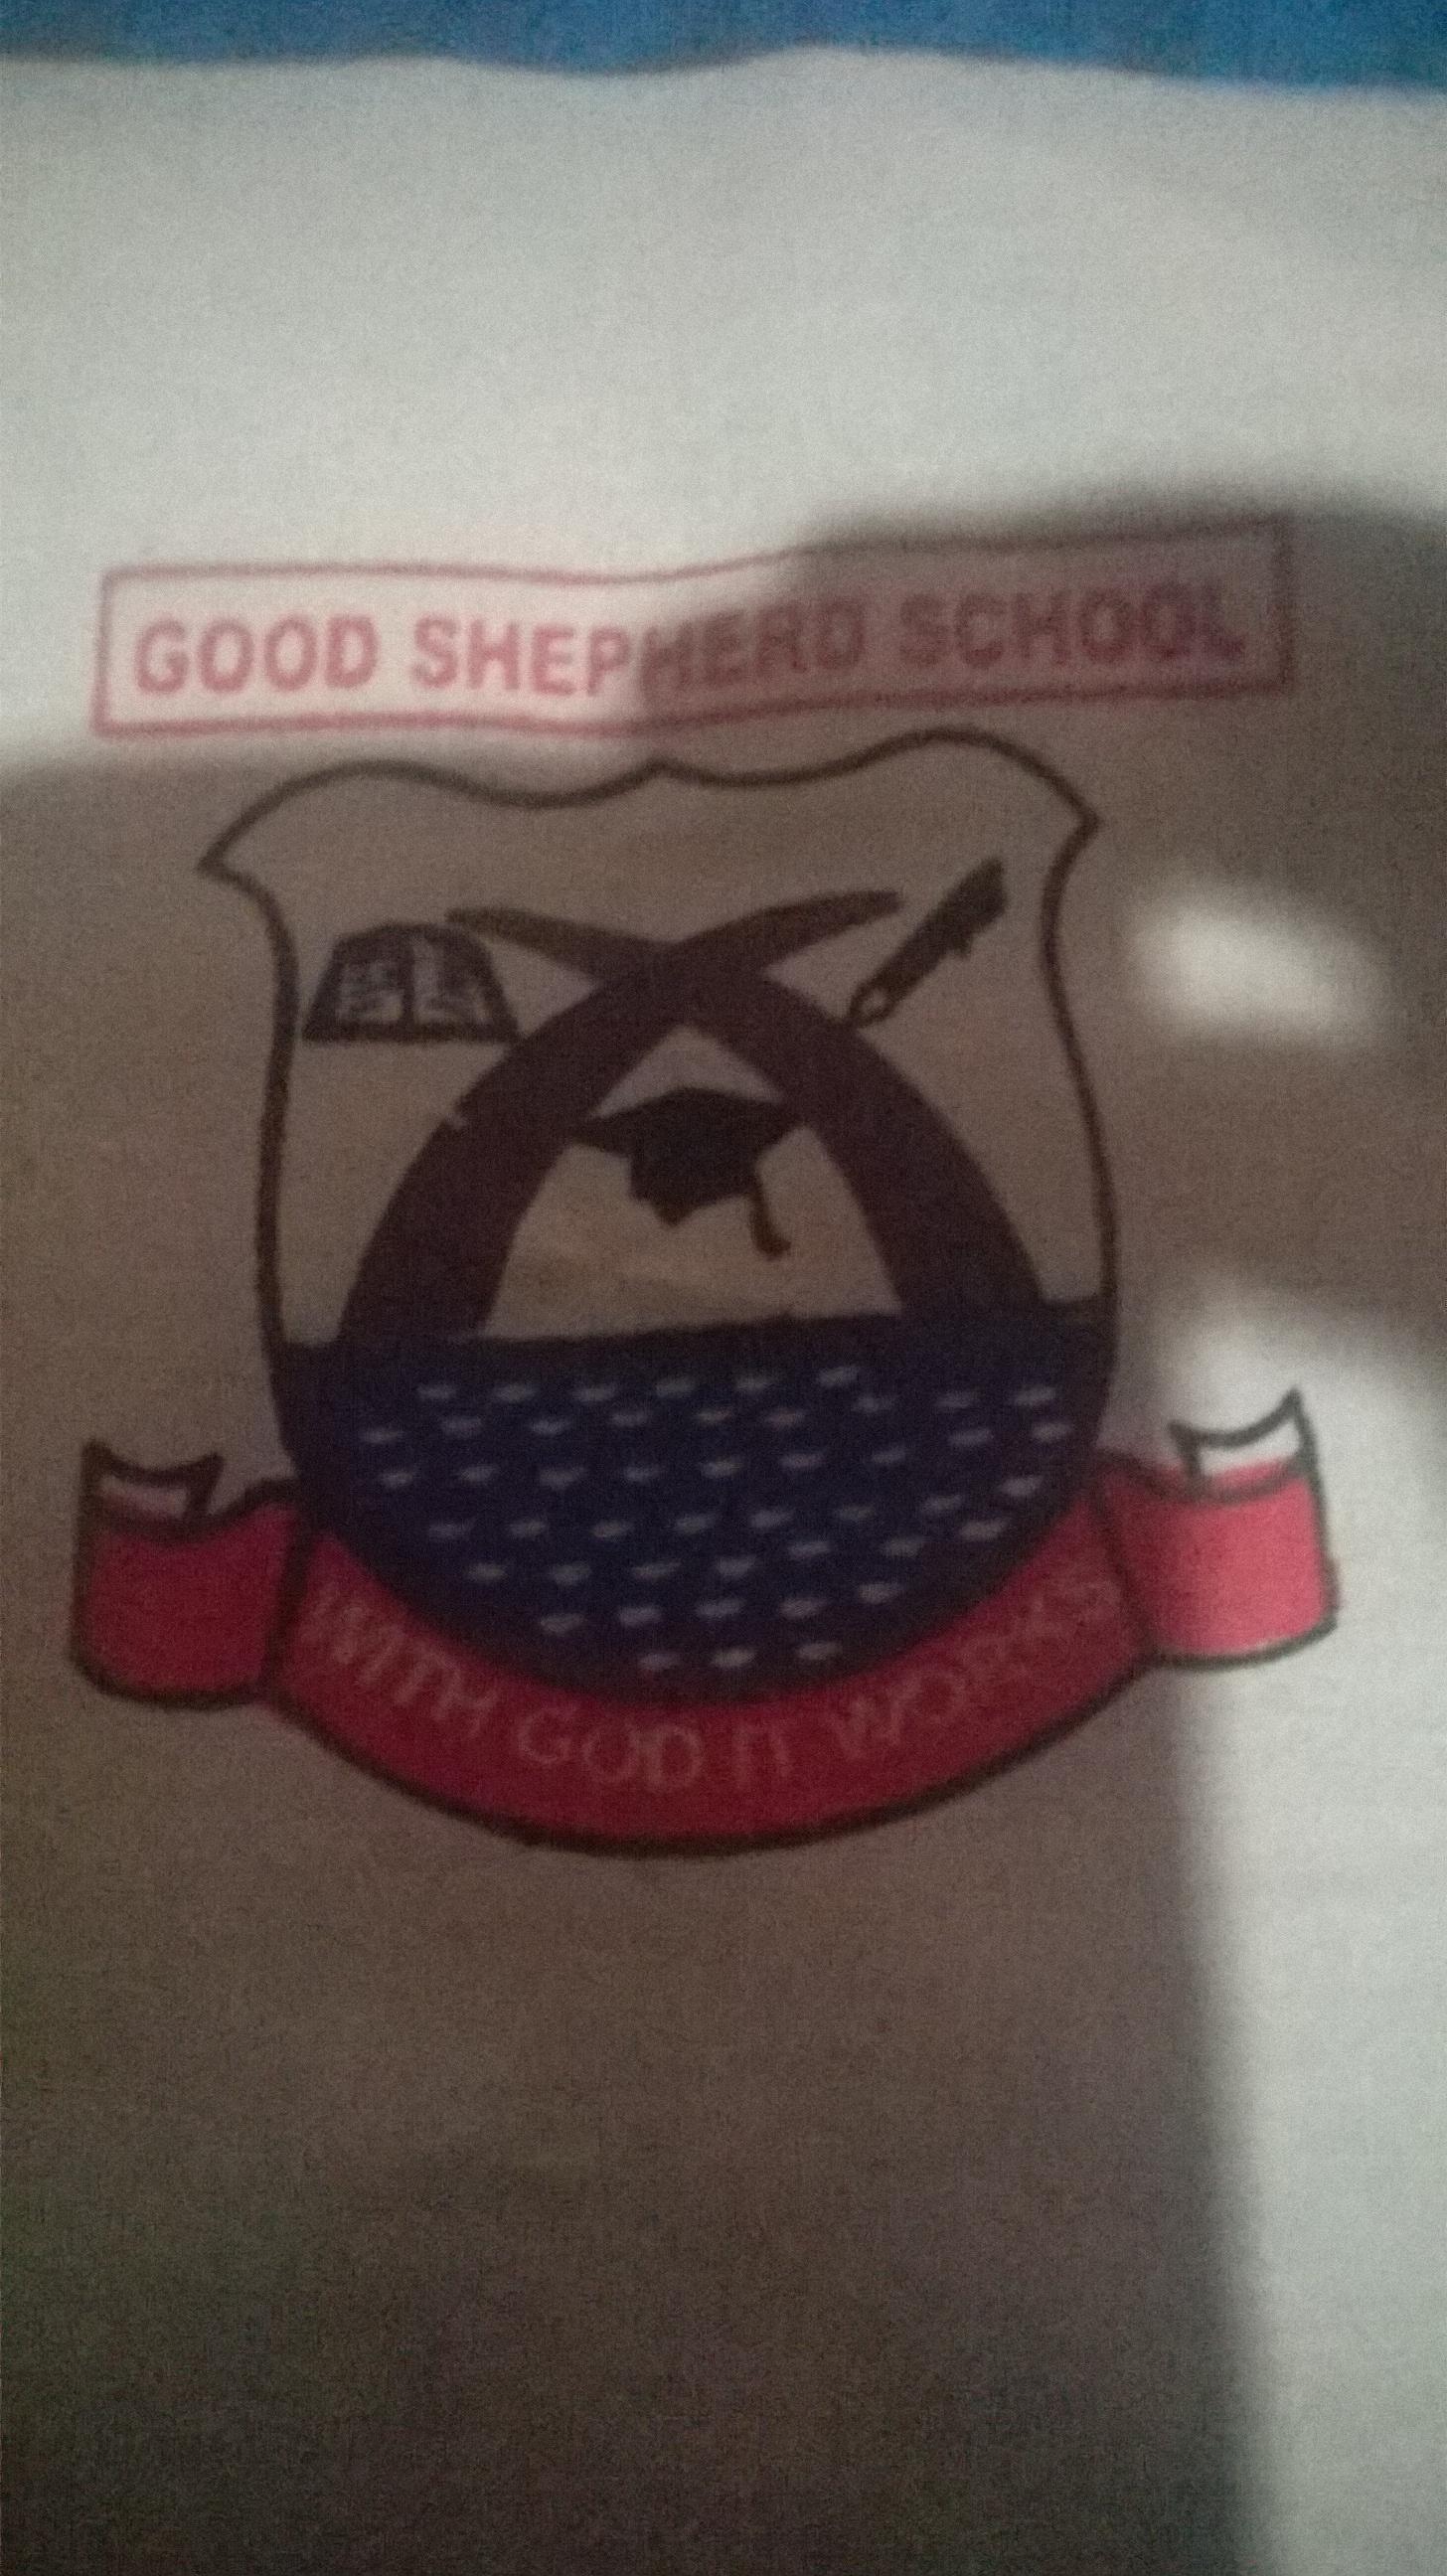 Good Shepherd Community Centre